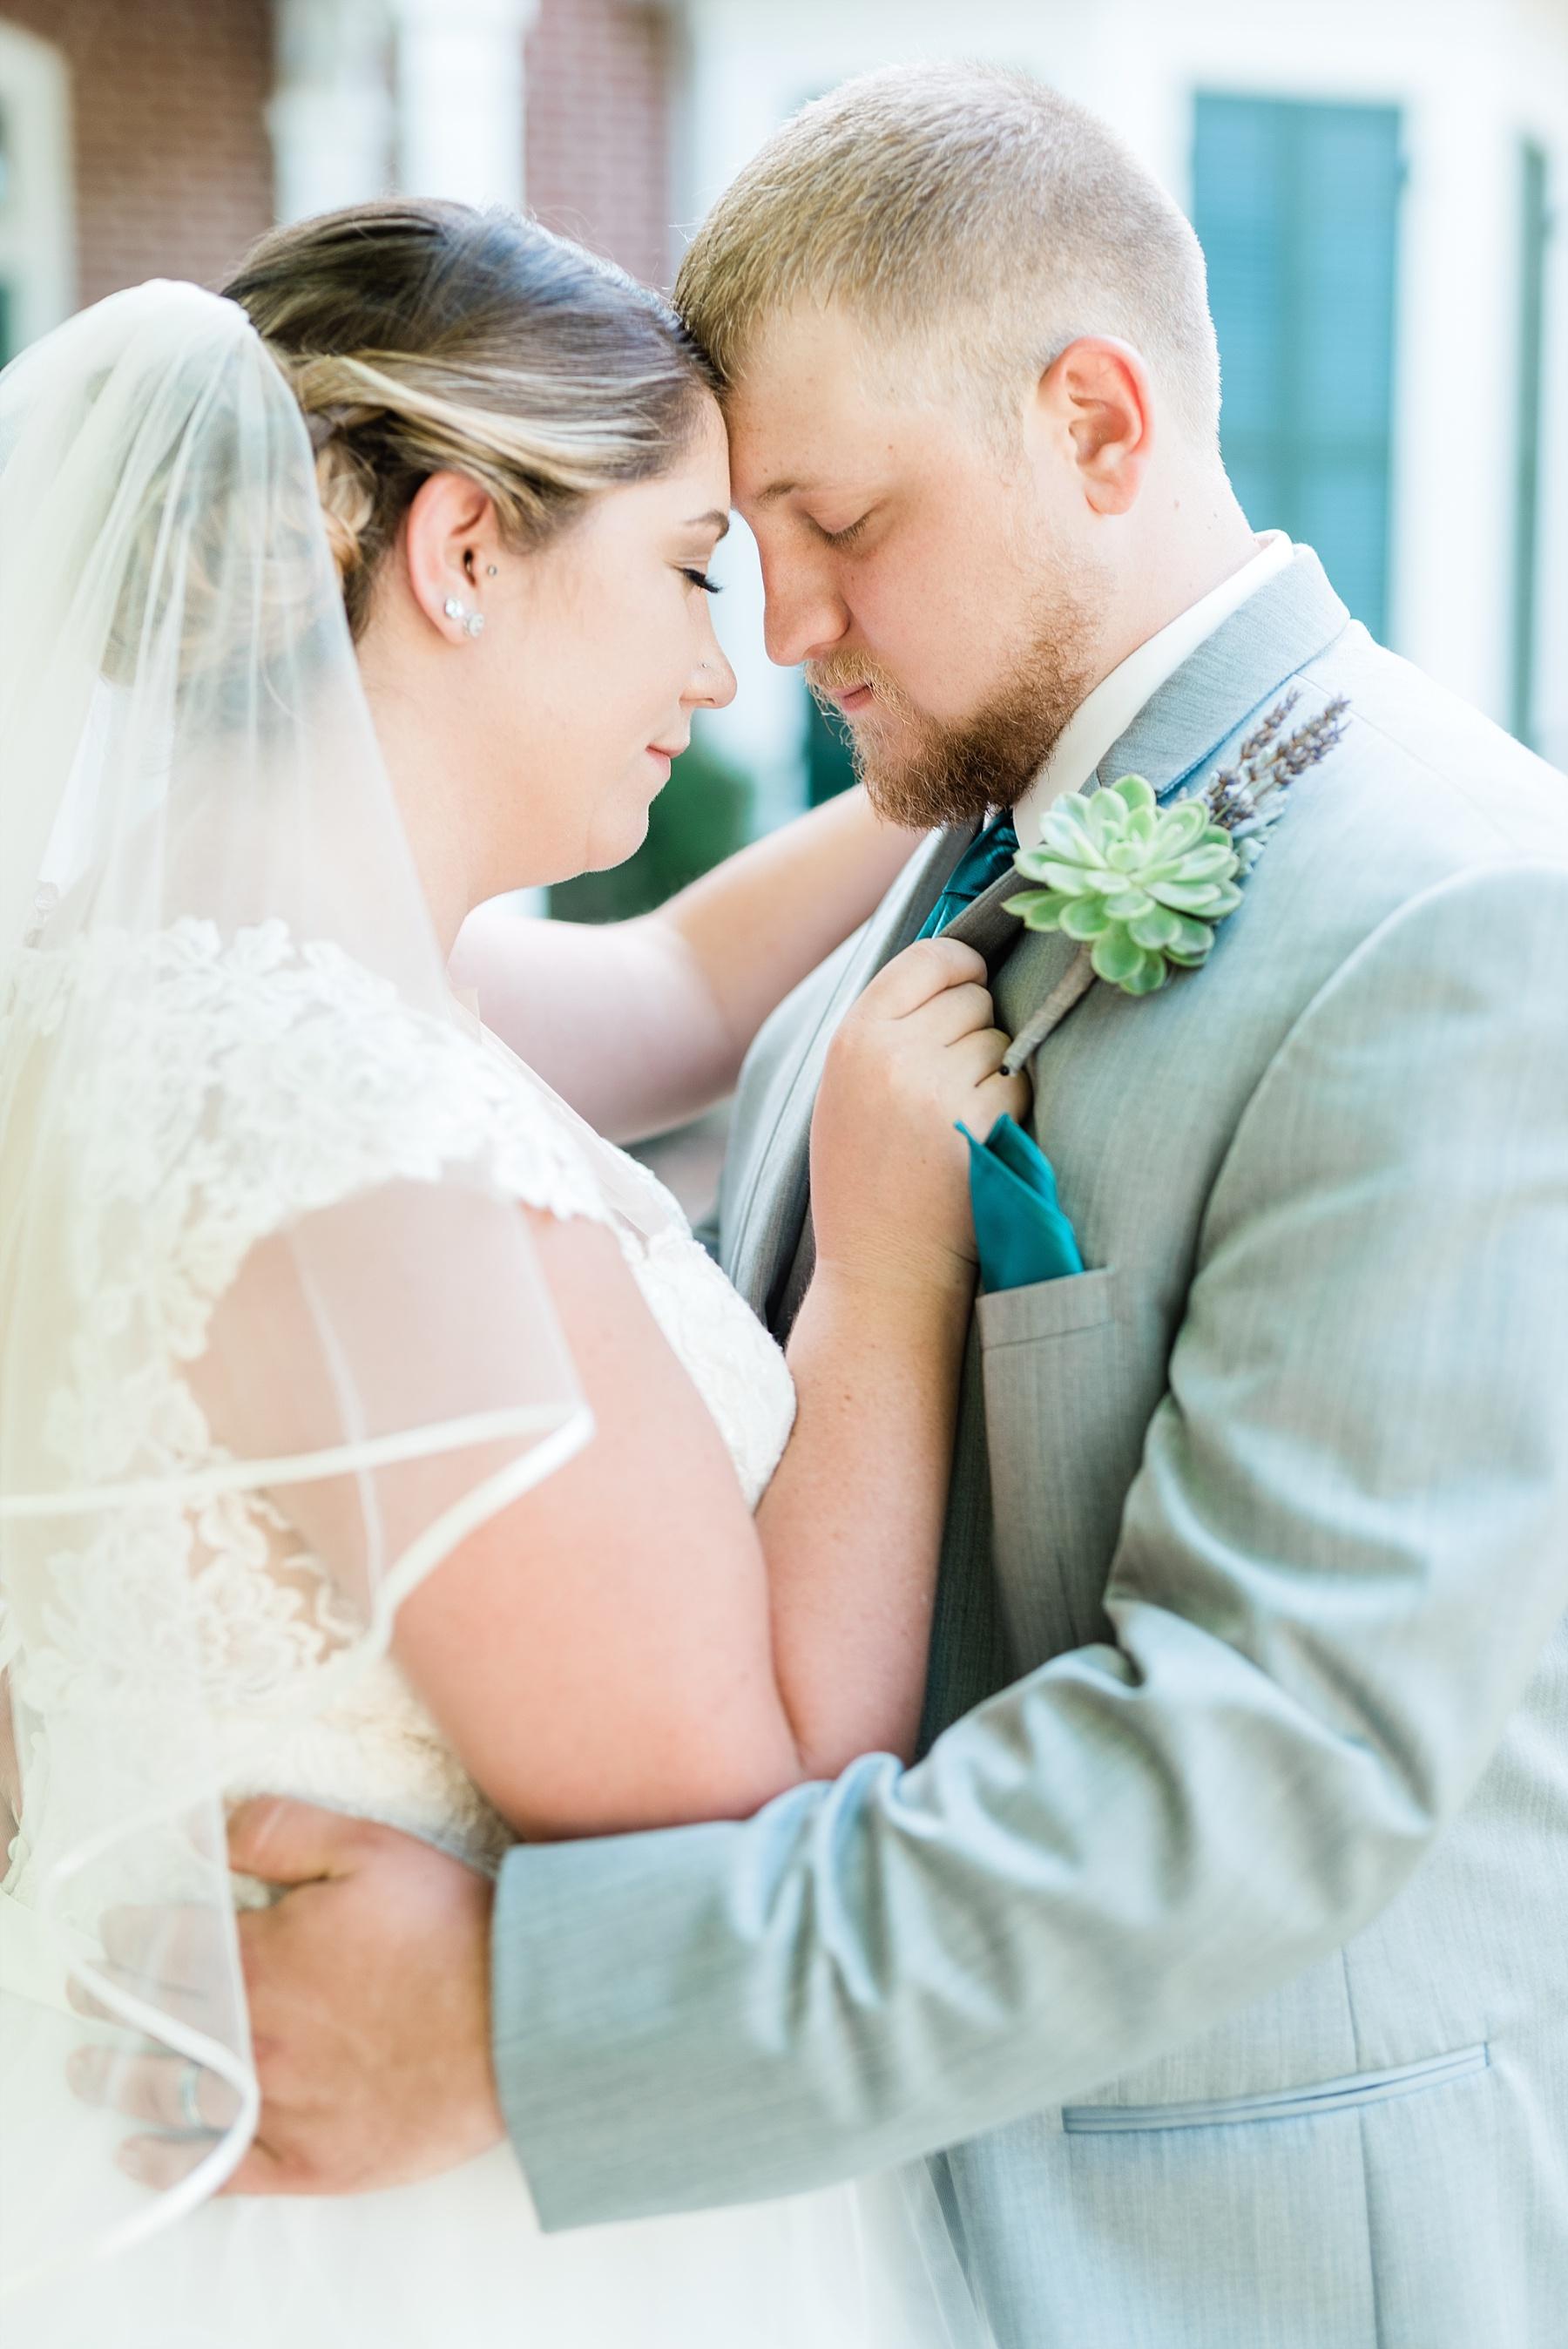 Baurichter Wedding at Stoney Creek Inn Columbia Missouri by Kelsi Kliethermes Photography_0023.jpg